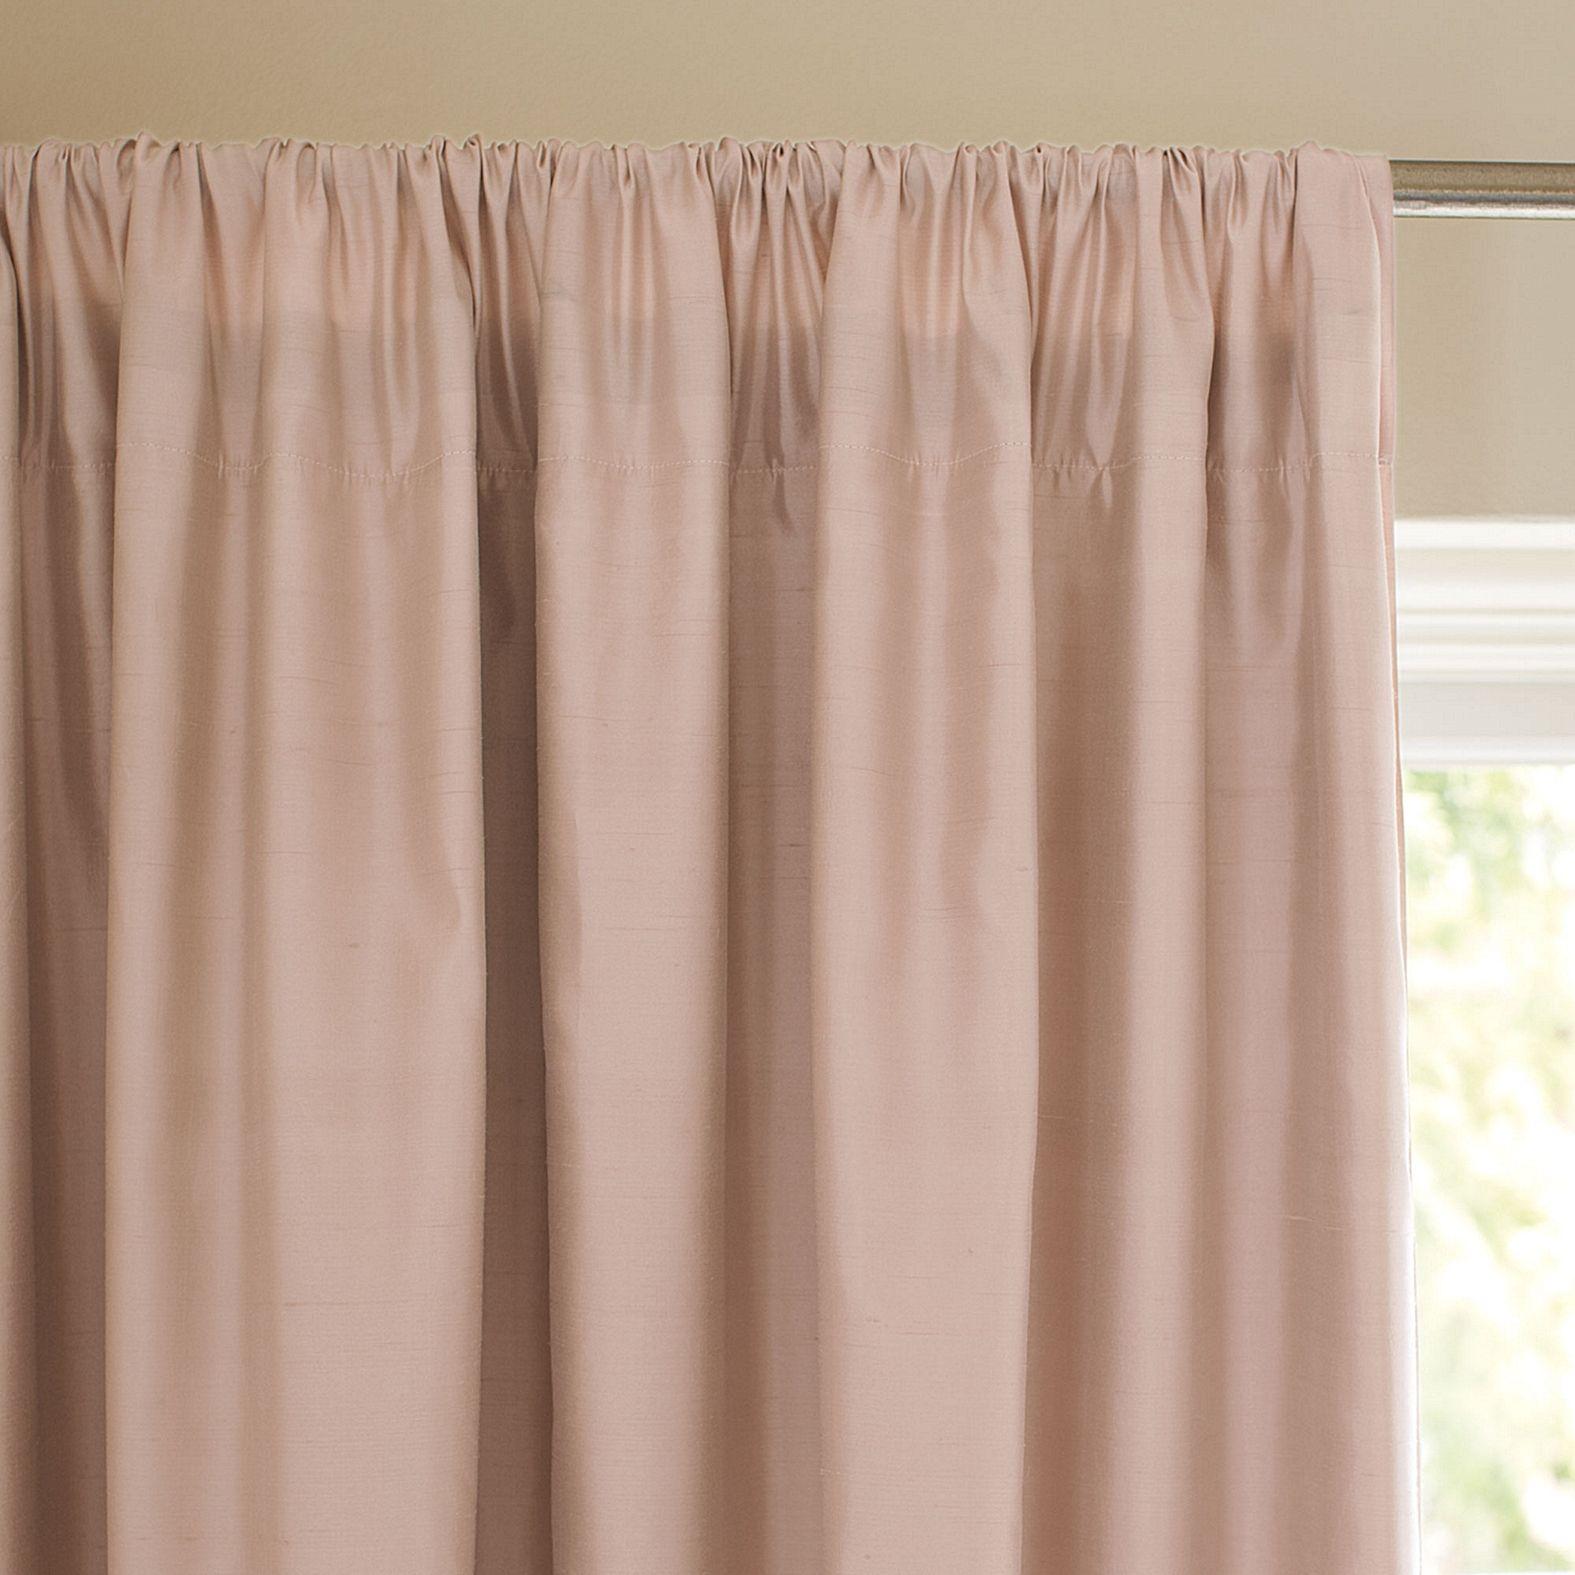 Blush Silk Shantung Window Panel Serena Lily Blush Curtains